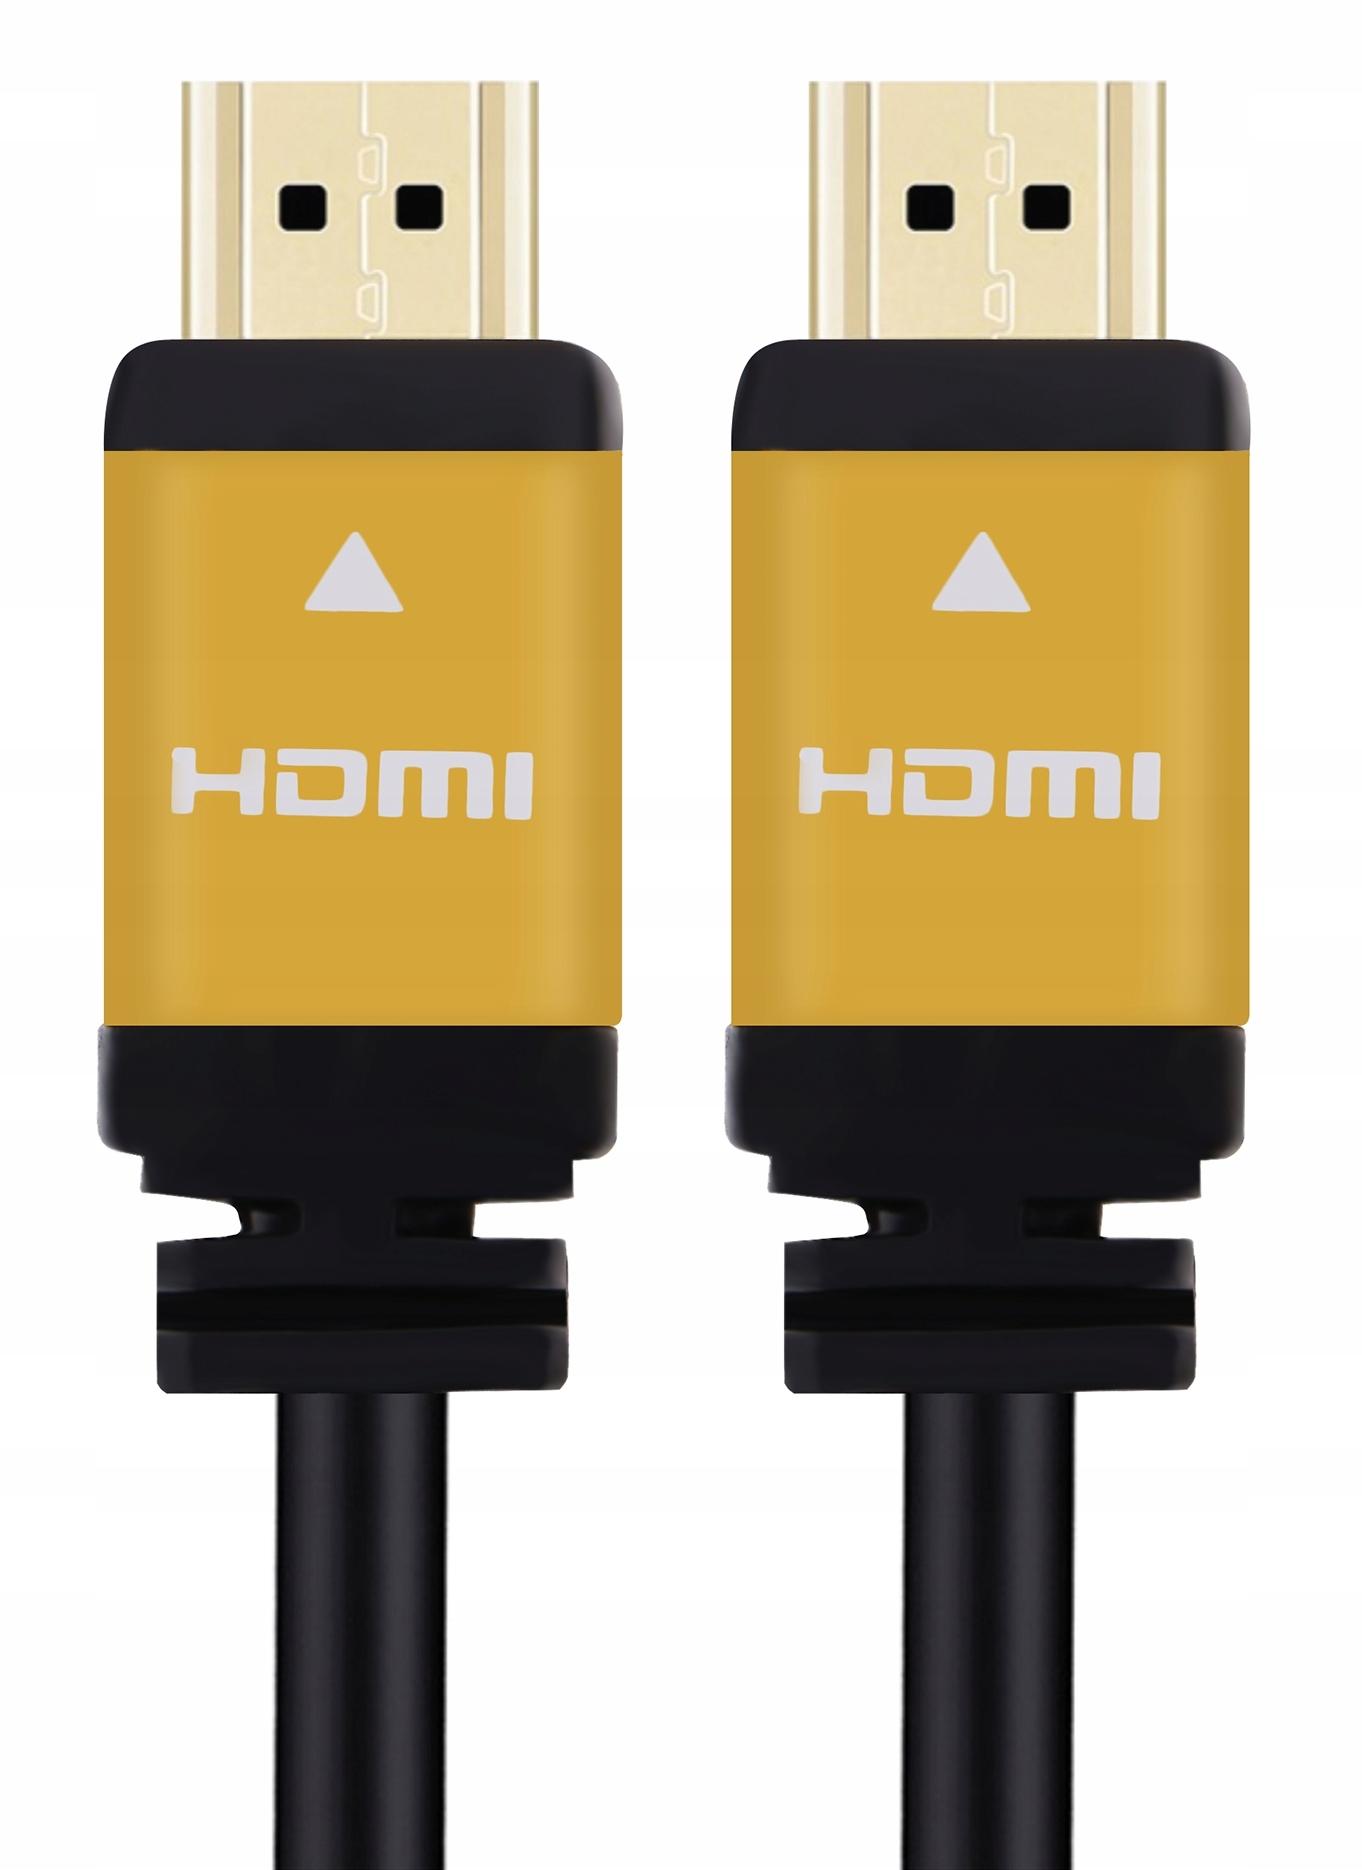 HDMI 2.0 10M UHD 2160P 4K / 60Hz 3D 48-битный кабель